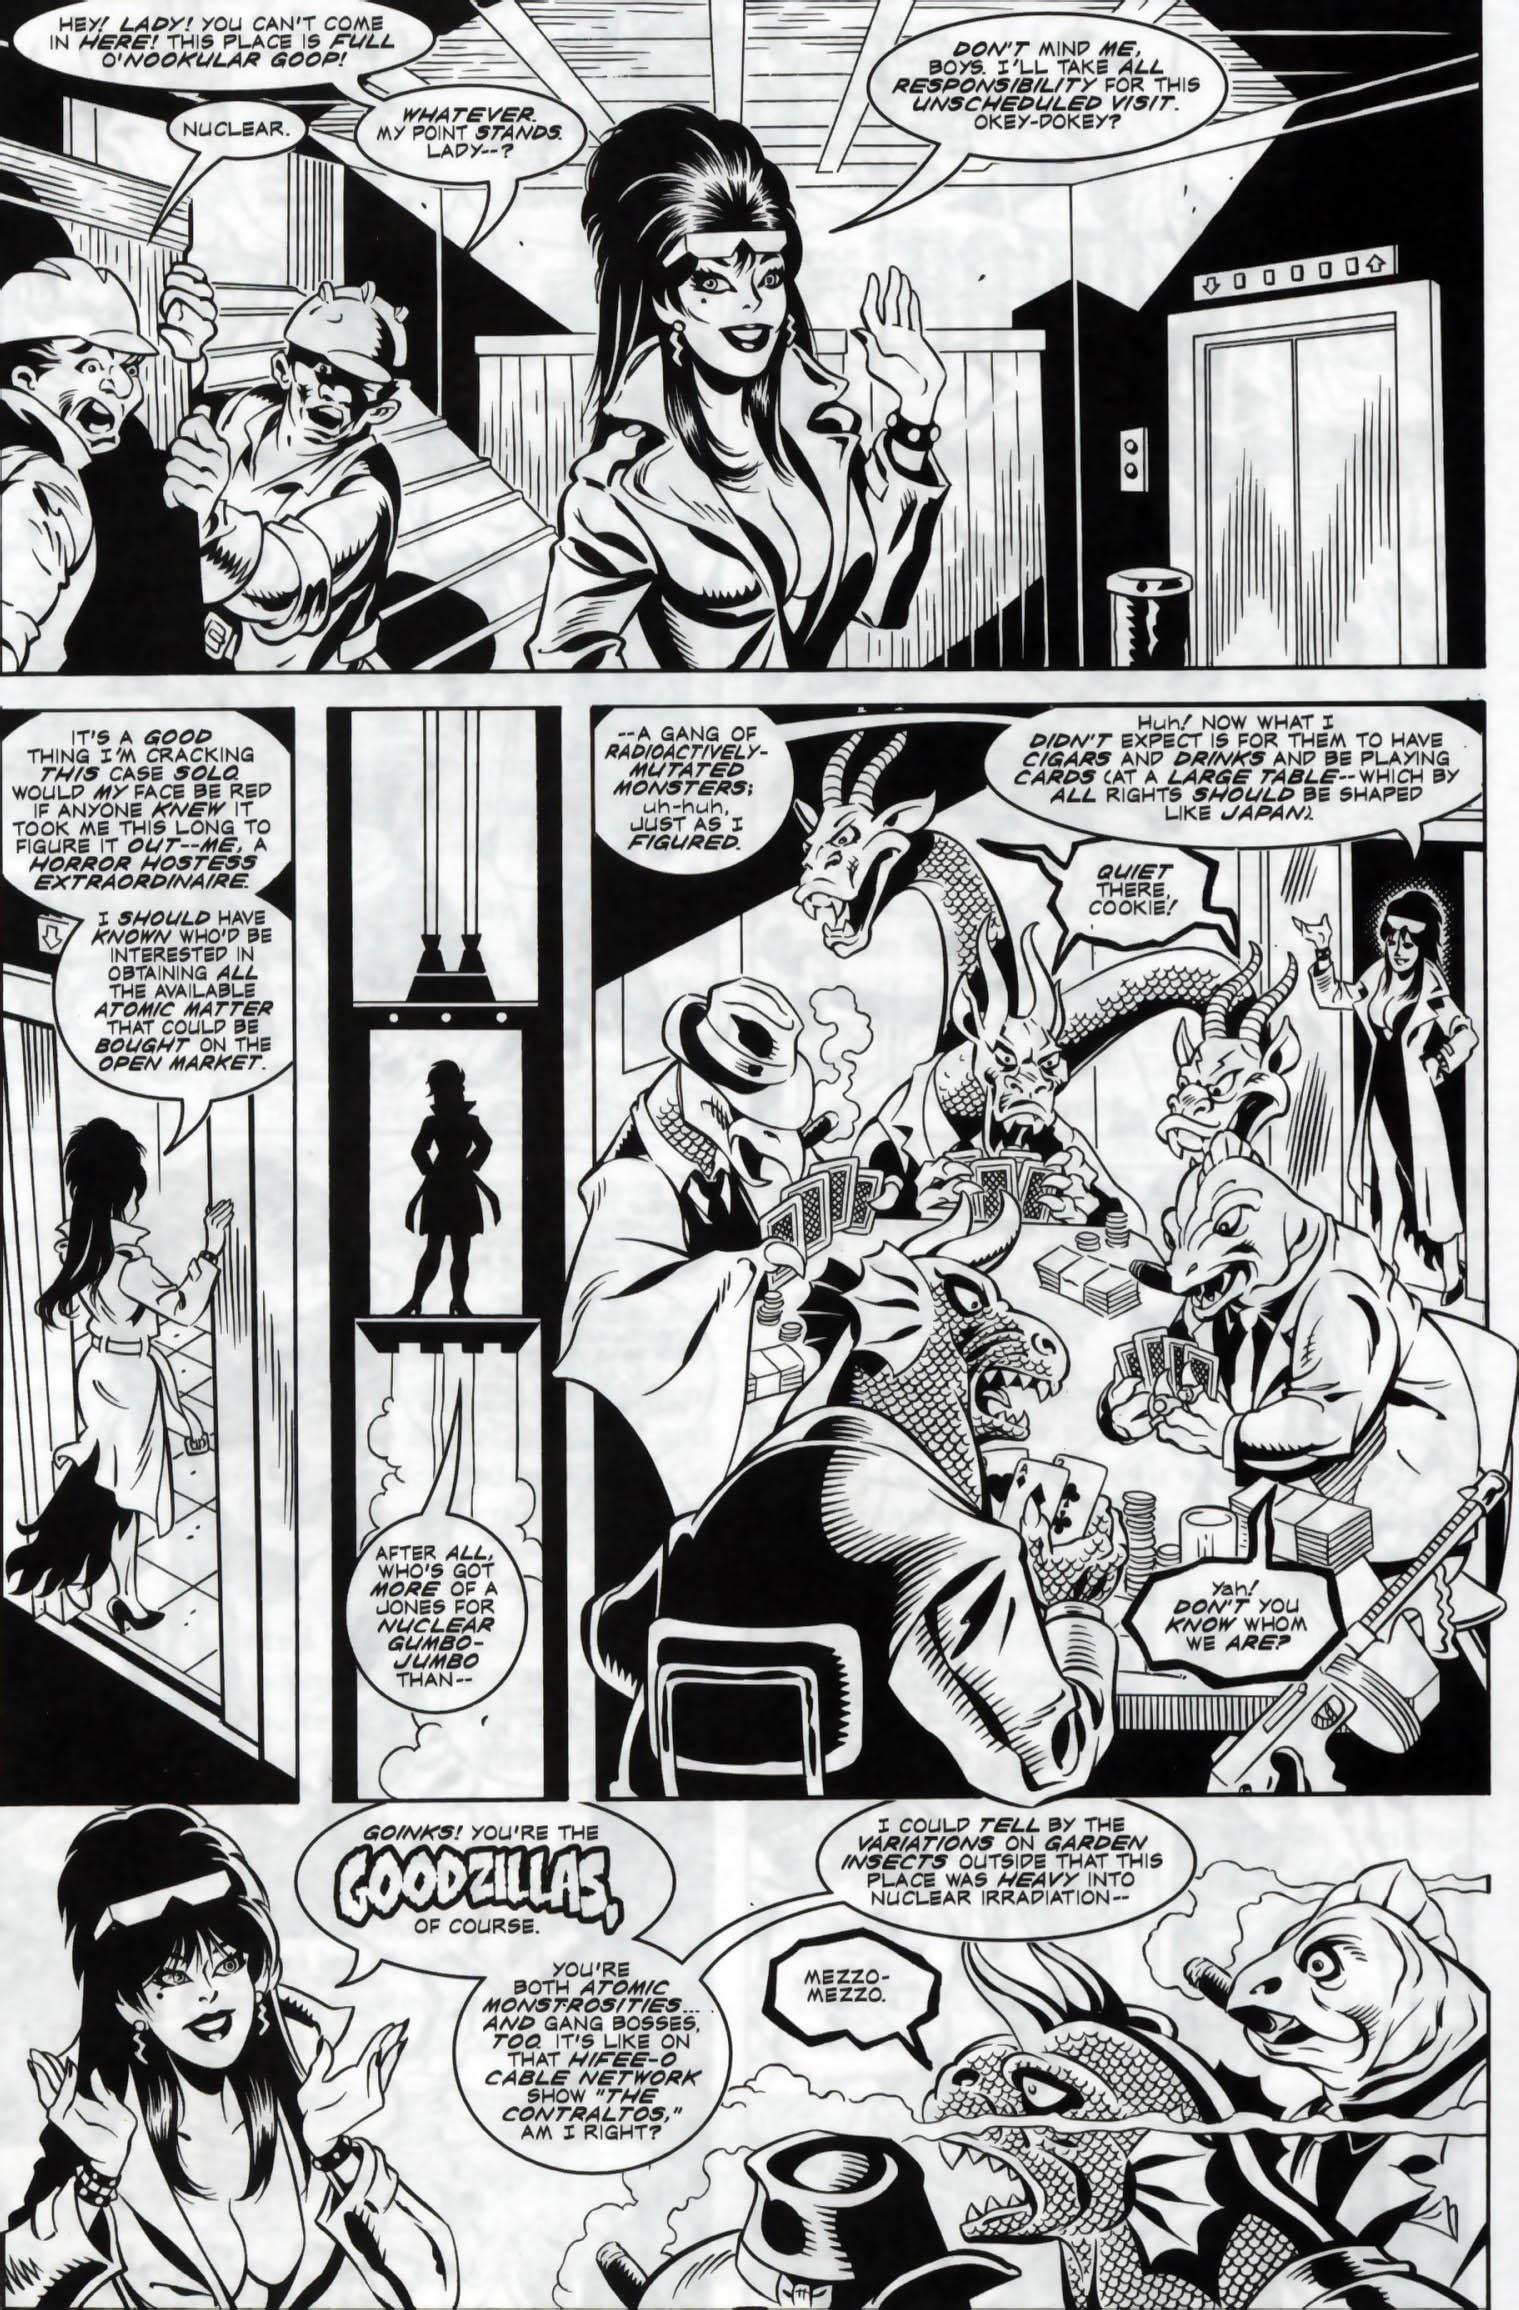 Read online Elvira, Mistress of the Dark comic -  Issue #120 - 24